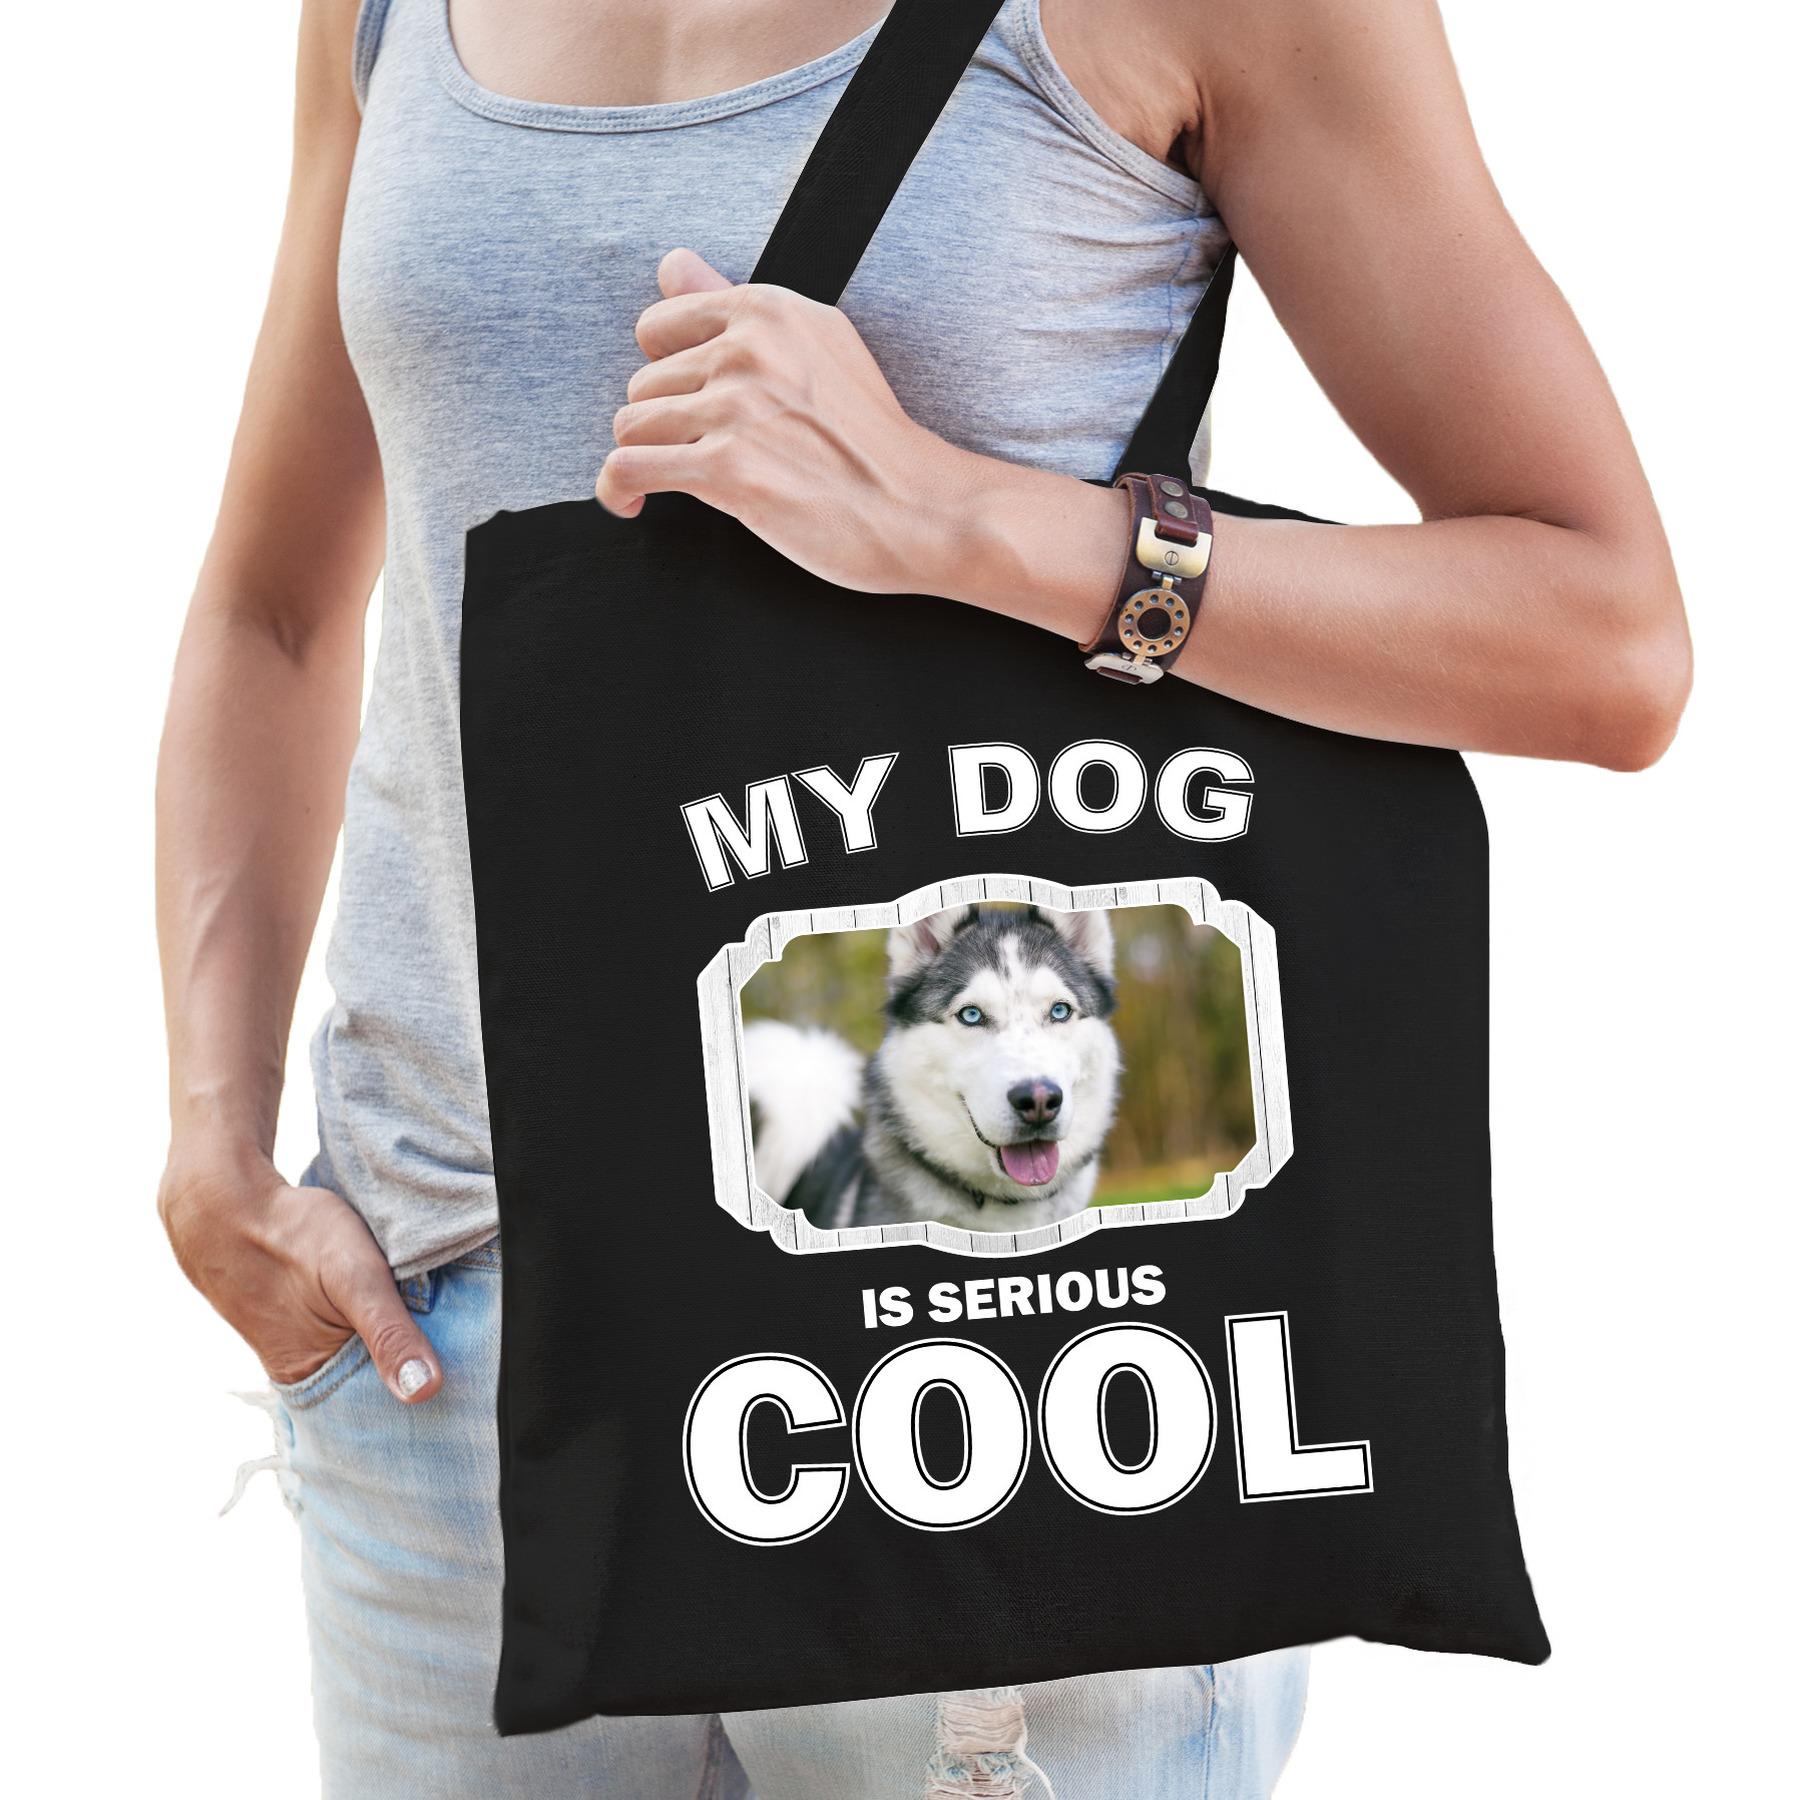 Katoenen tasje my dog is serious cool zwart - Husky honden cadeau tas